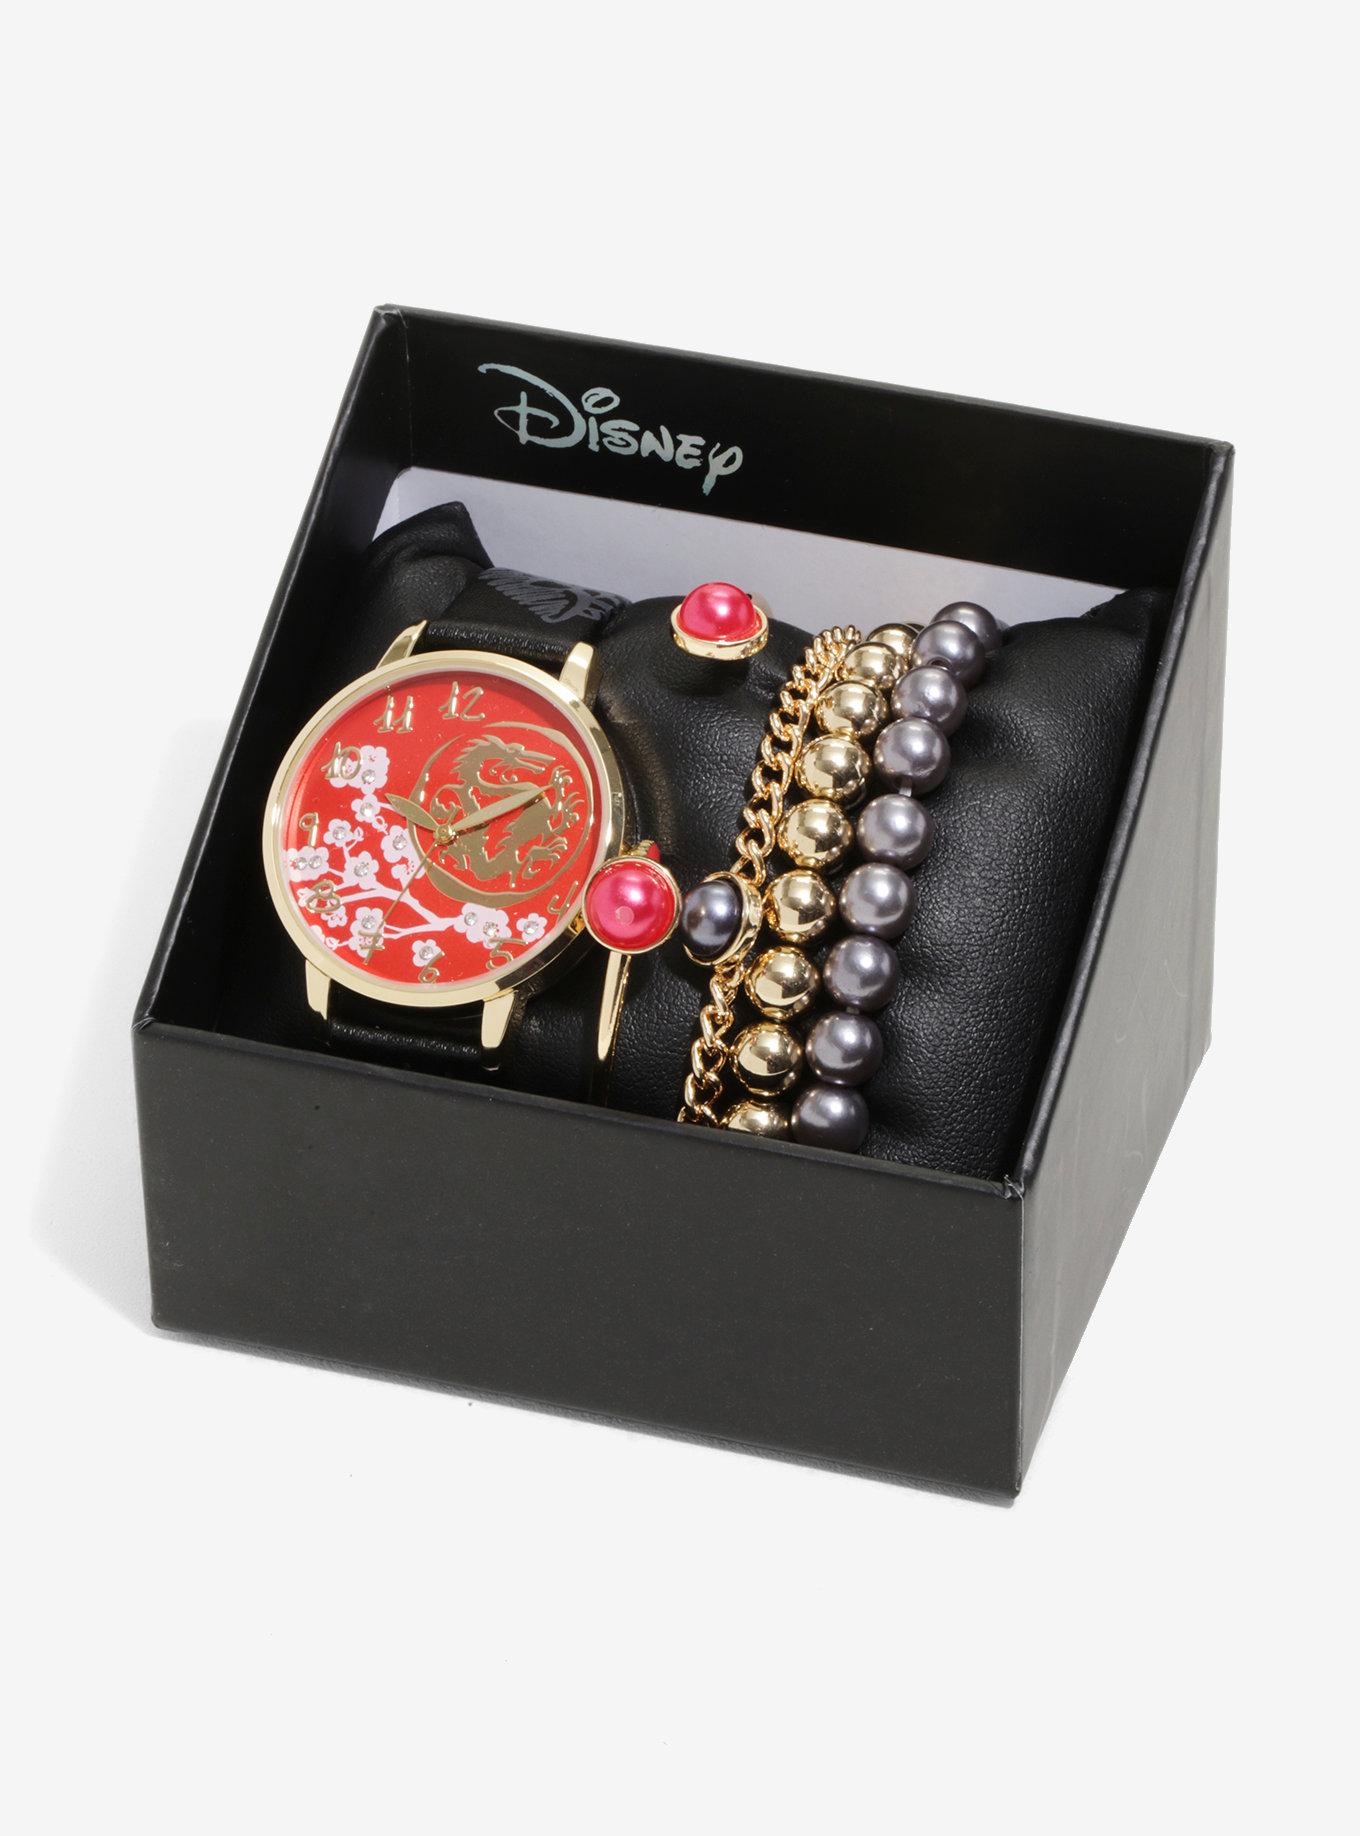 Conjunto de braceletes e relógio